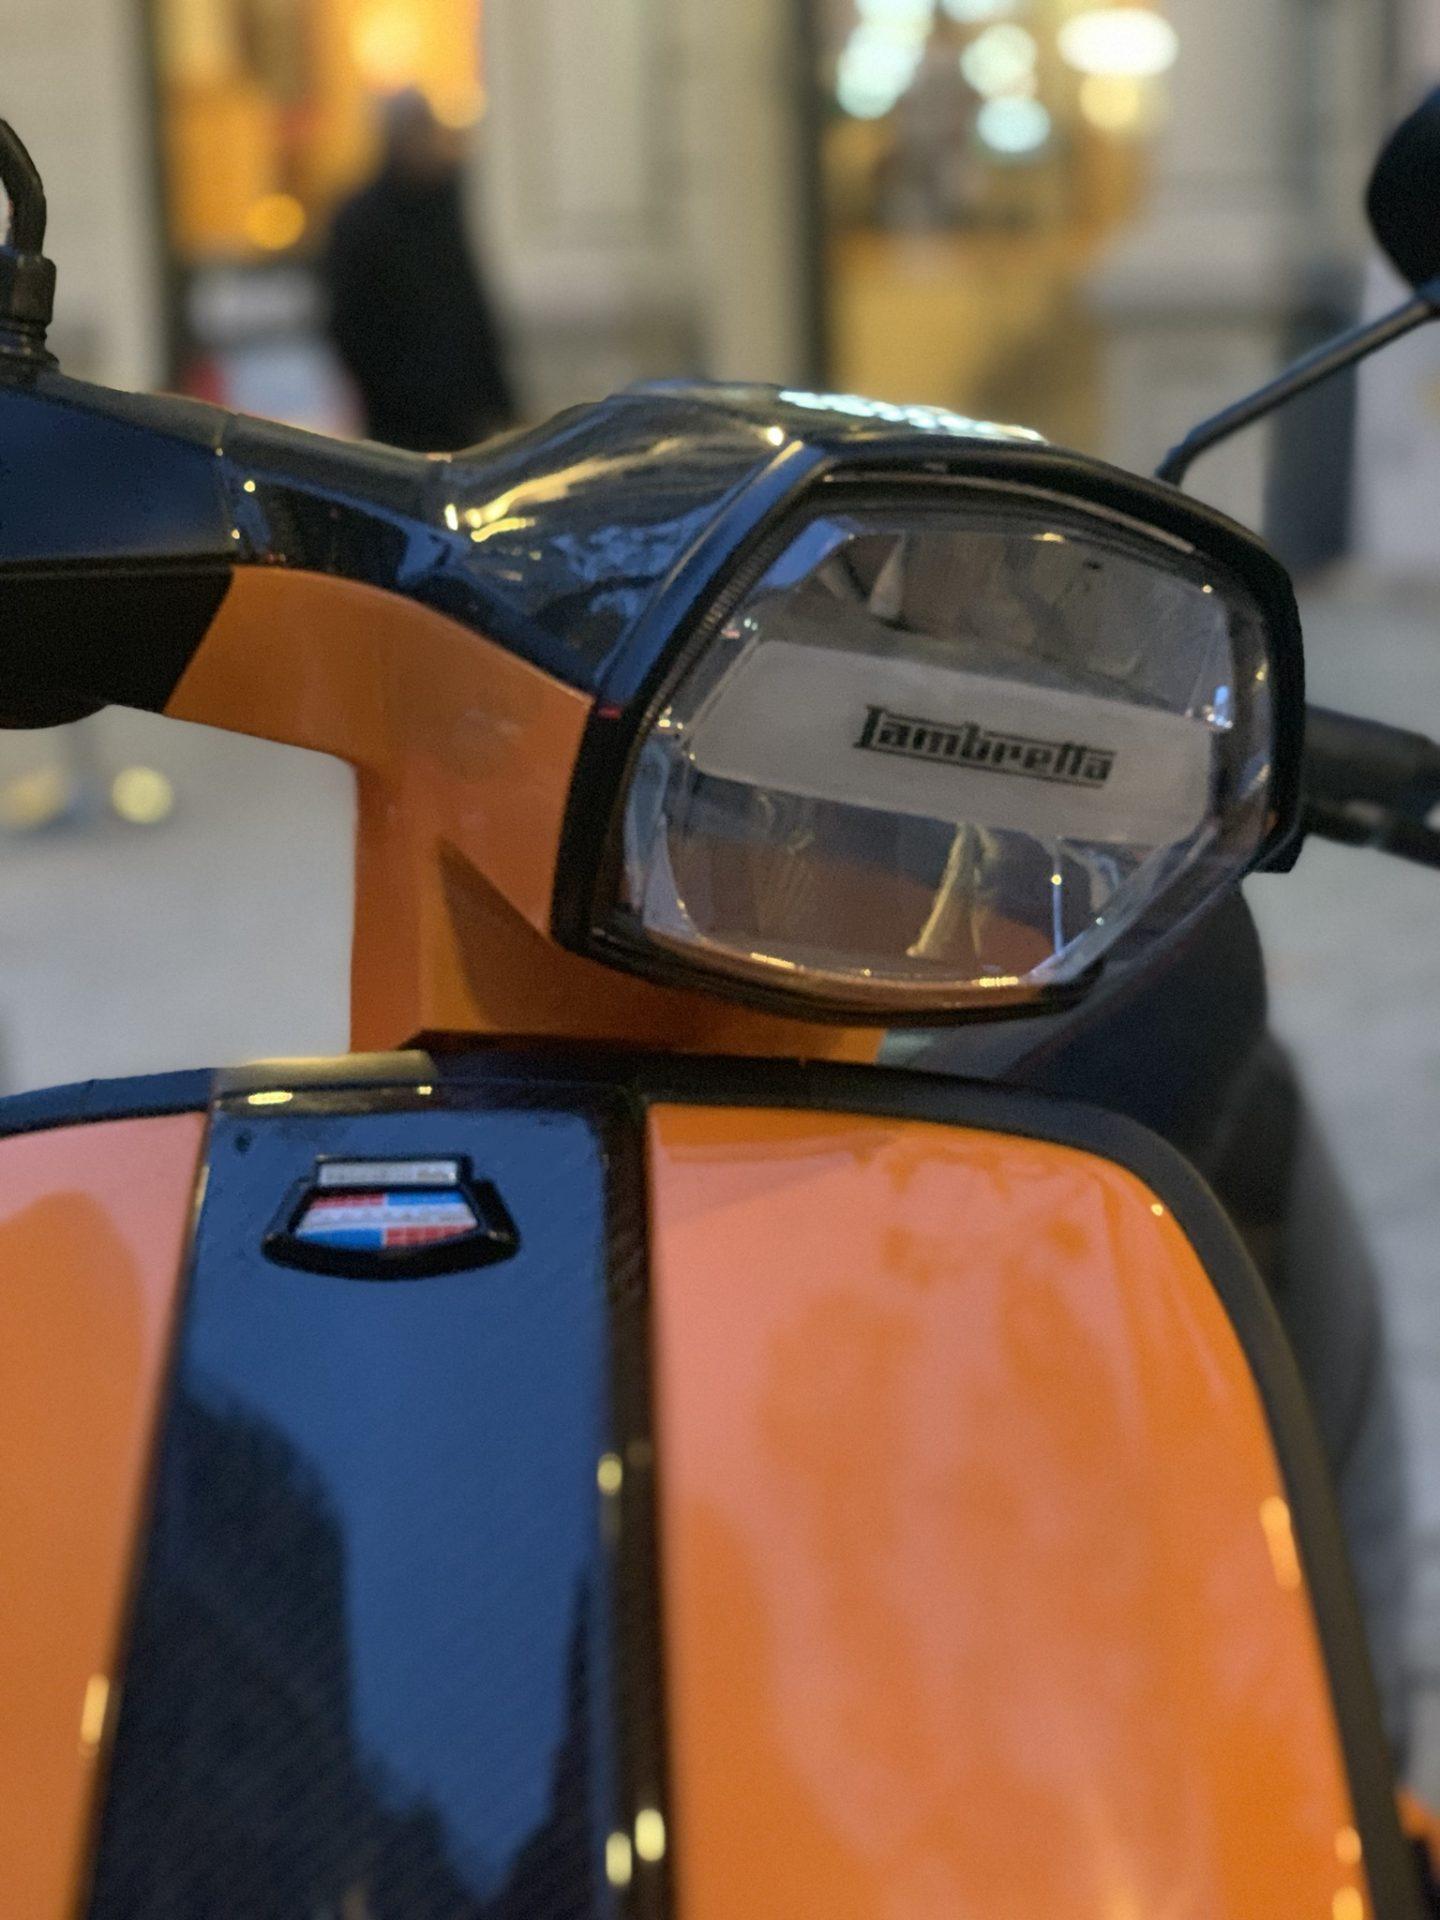 Lambretta 125 2018